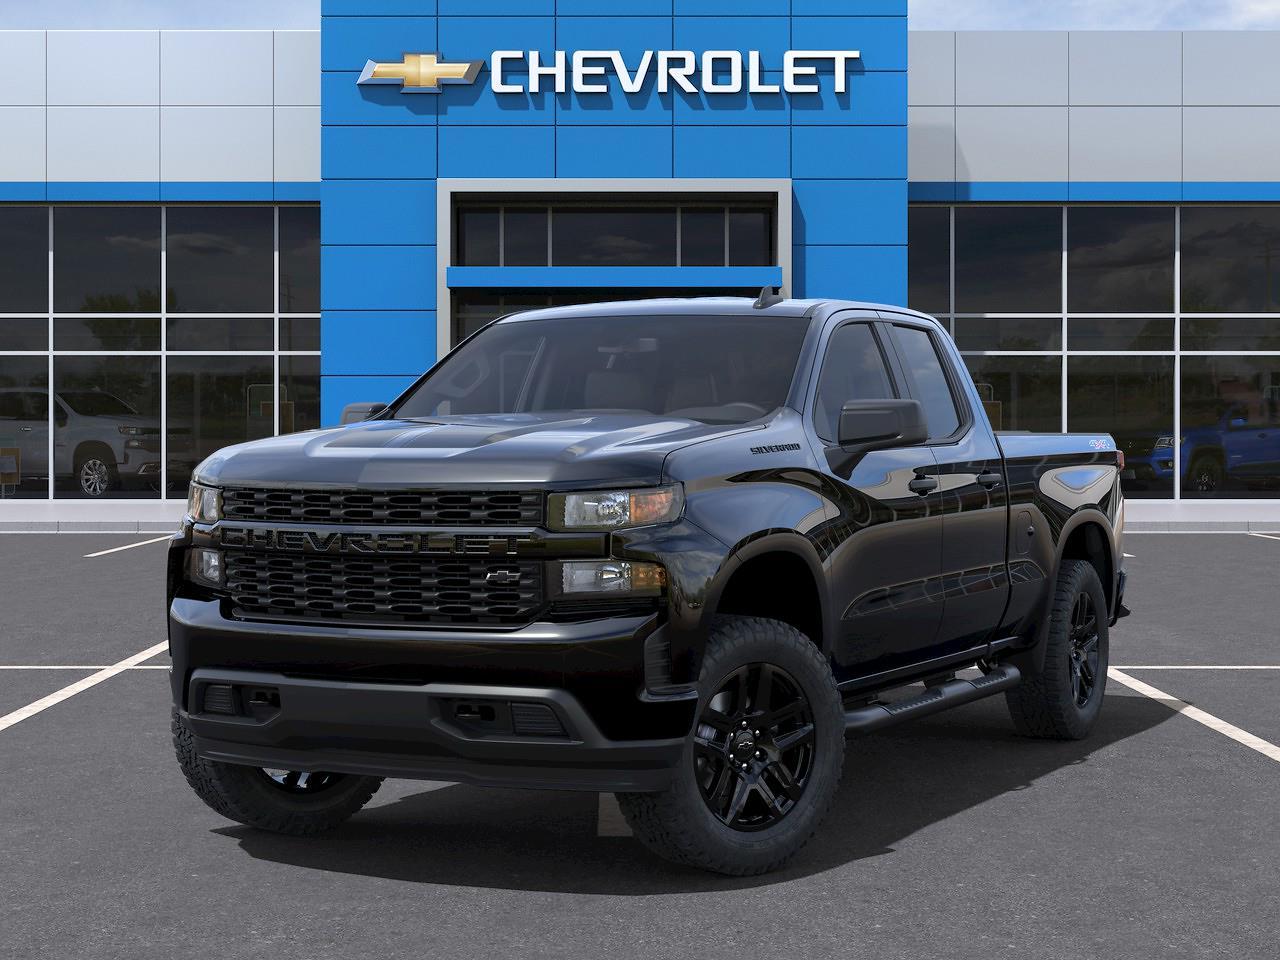 2021 Chevrolet Silverado 1500 Double Cab 4x4, Pickup #Q210463 - photo 6